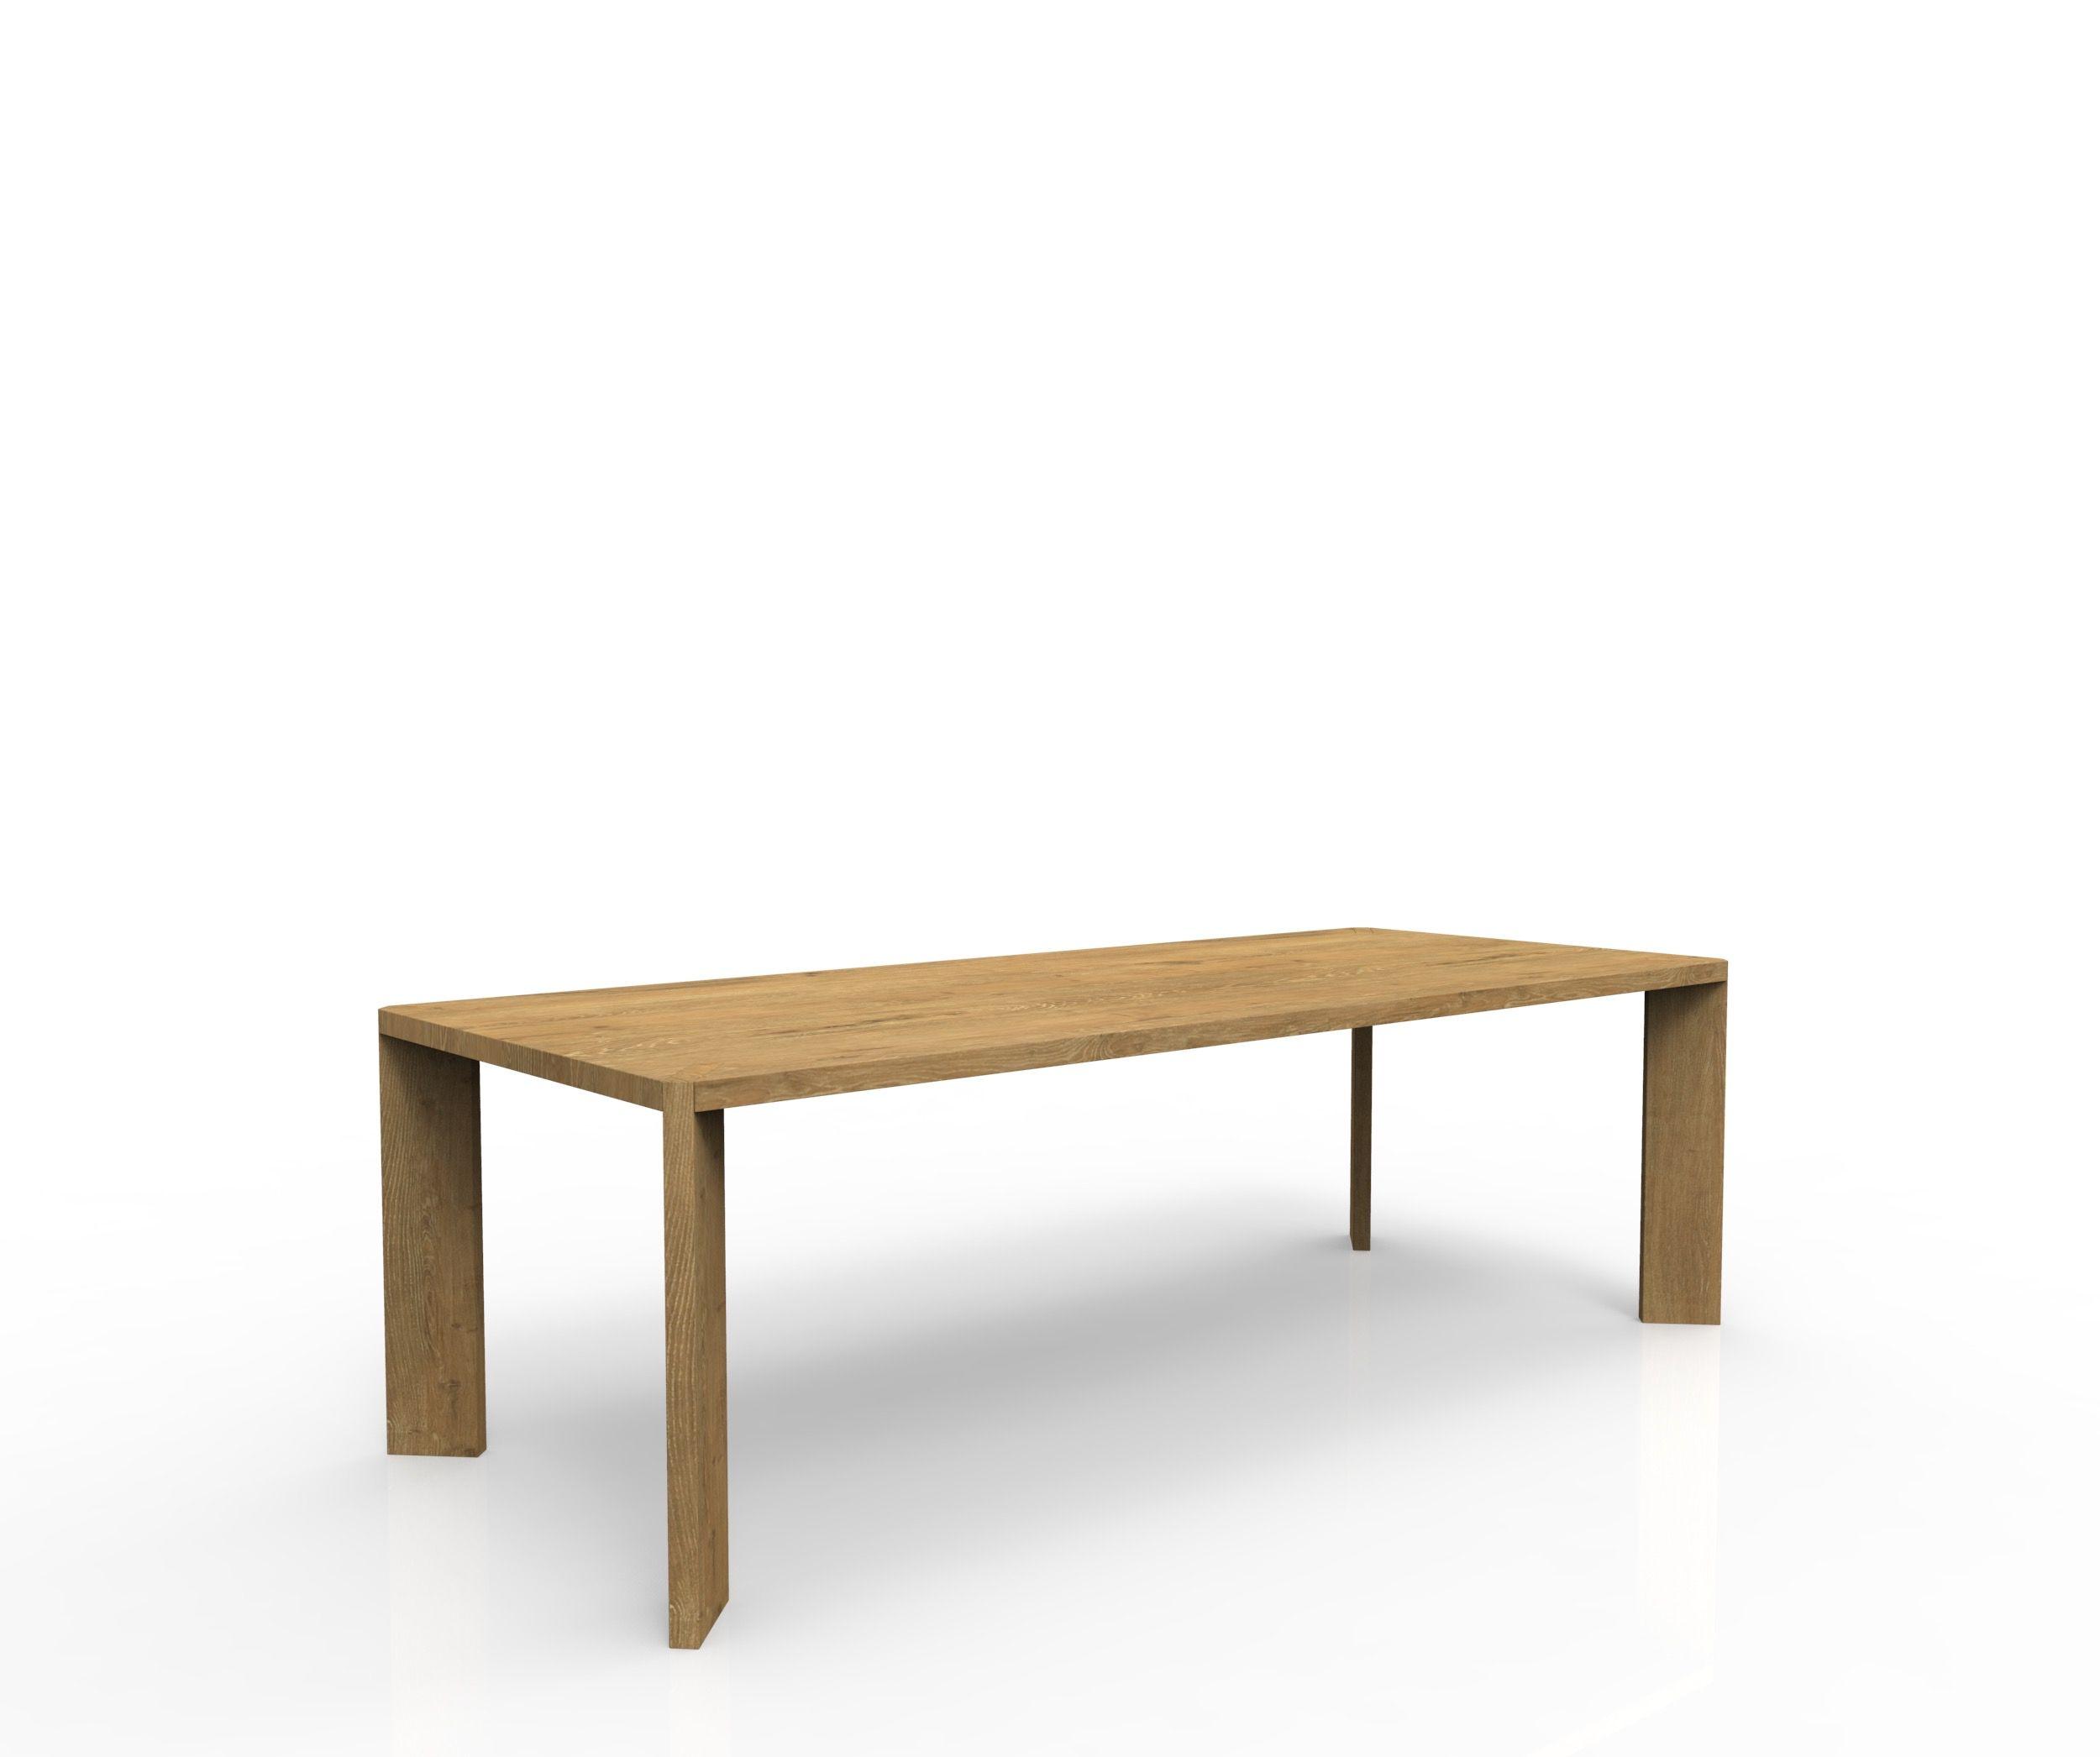 Manero table miniforms salonedelmobile2015 madeinItaly